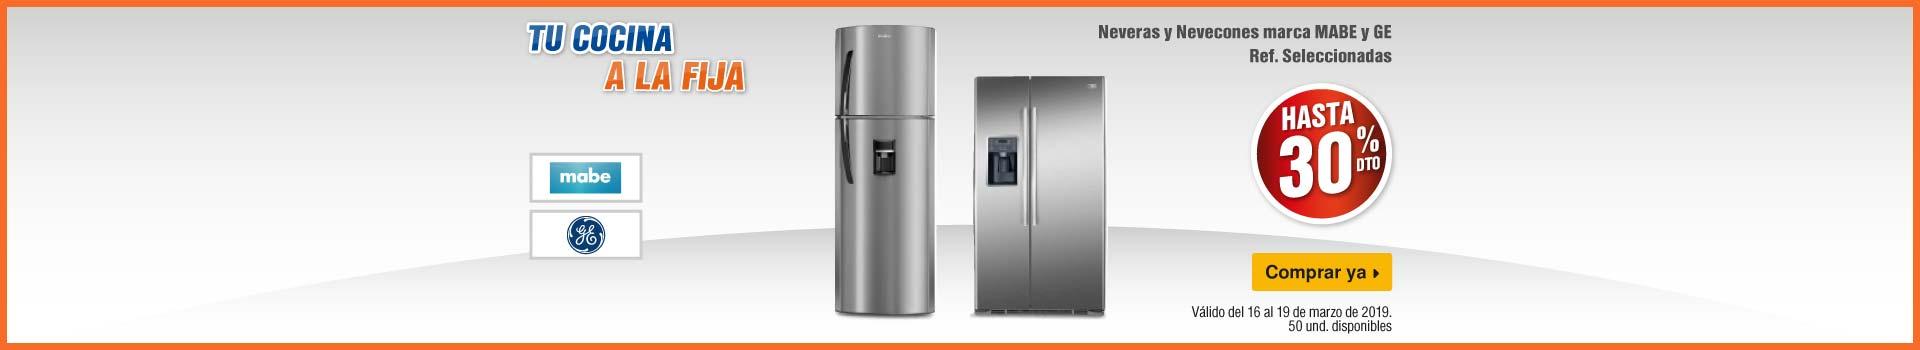 AK-KT-mayores-2-ELECT-BCAT-refrigeracion-mabe-160319-2